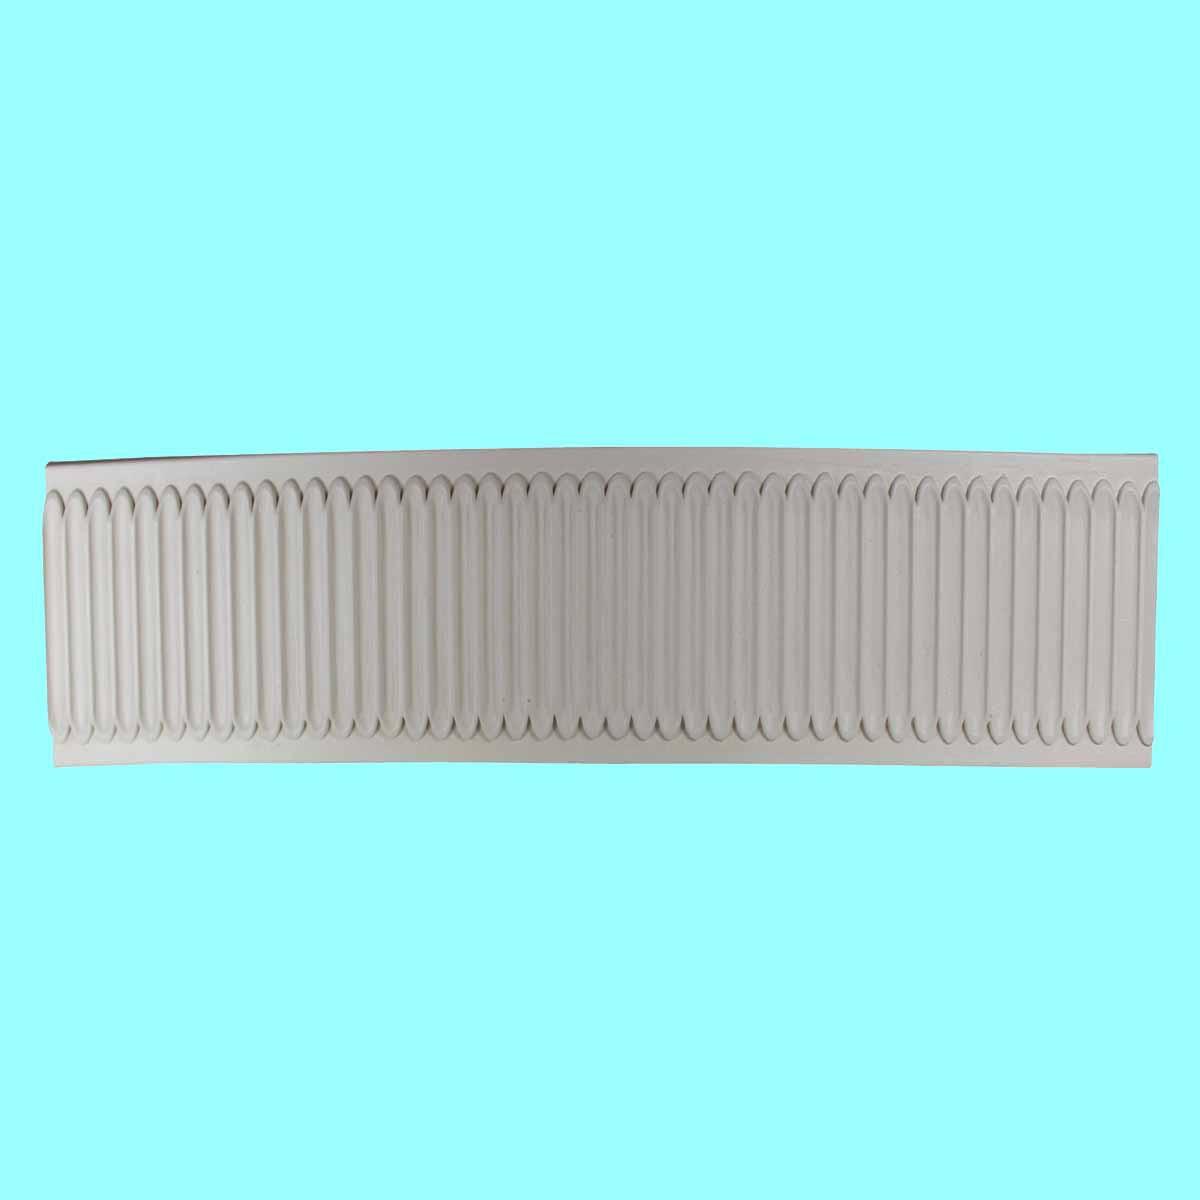 Cornice White Urethane Sample of 11661 Cornice Cornice Moulding Cornice Molding